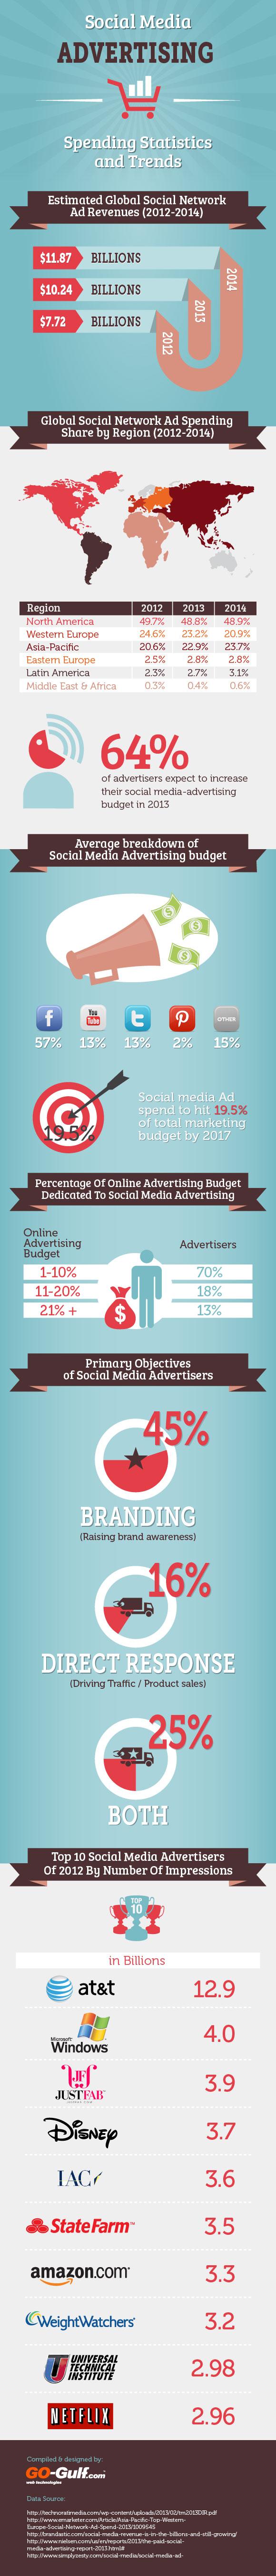 social media advertising resized 600